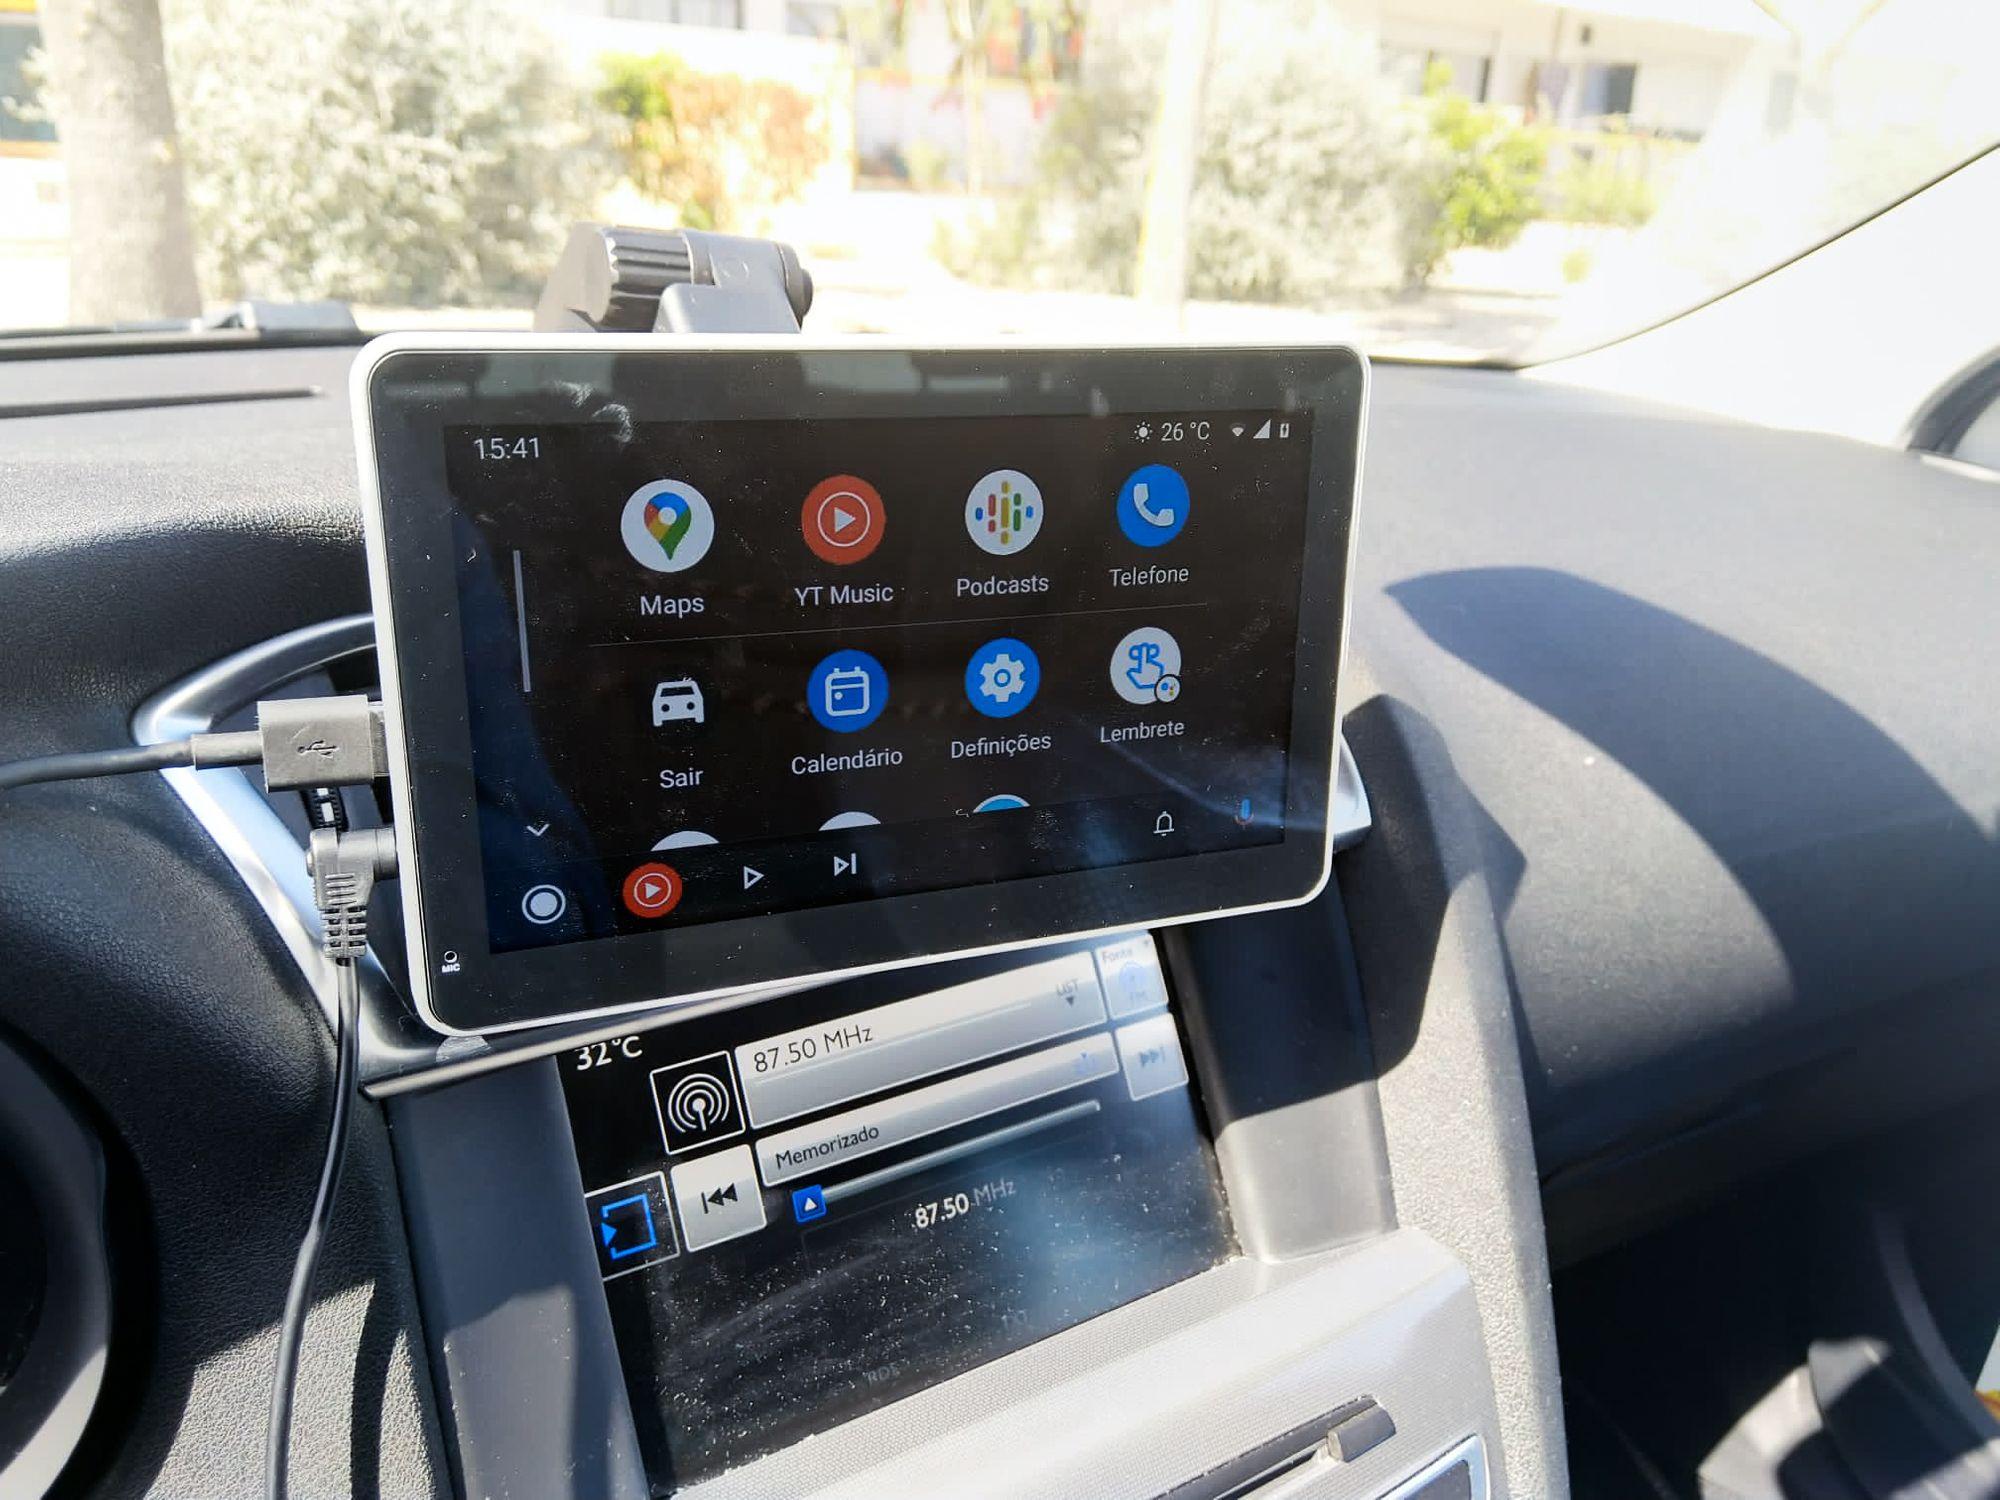 Android Auto/MirrorLink no Coral Vision CarPlay